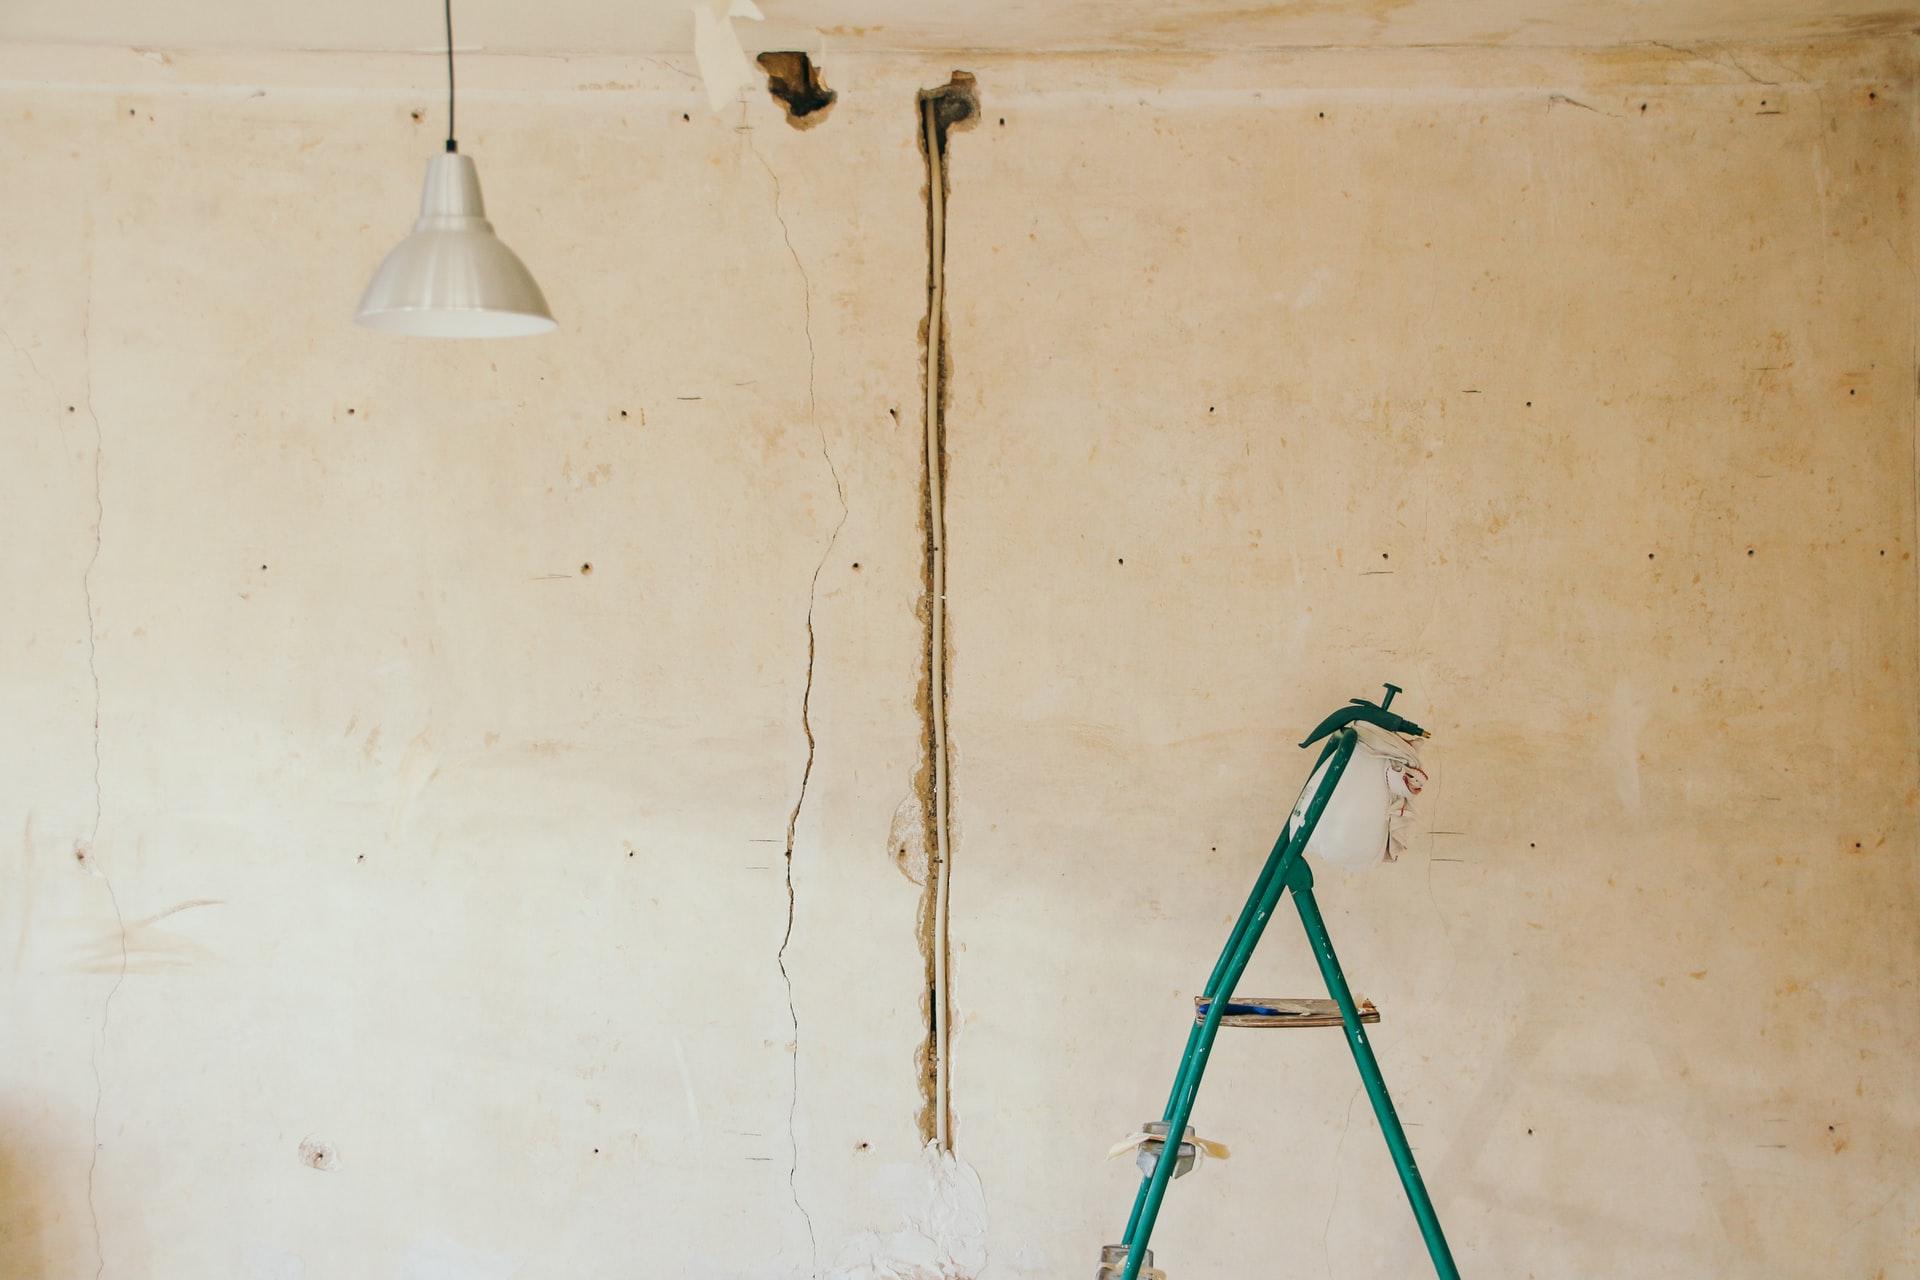 Drywall Repair Contractors Near You